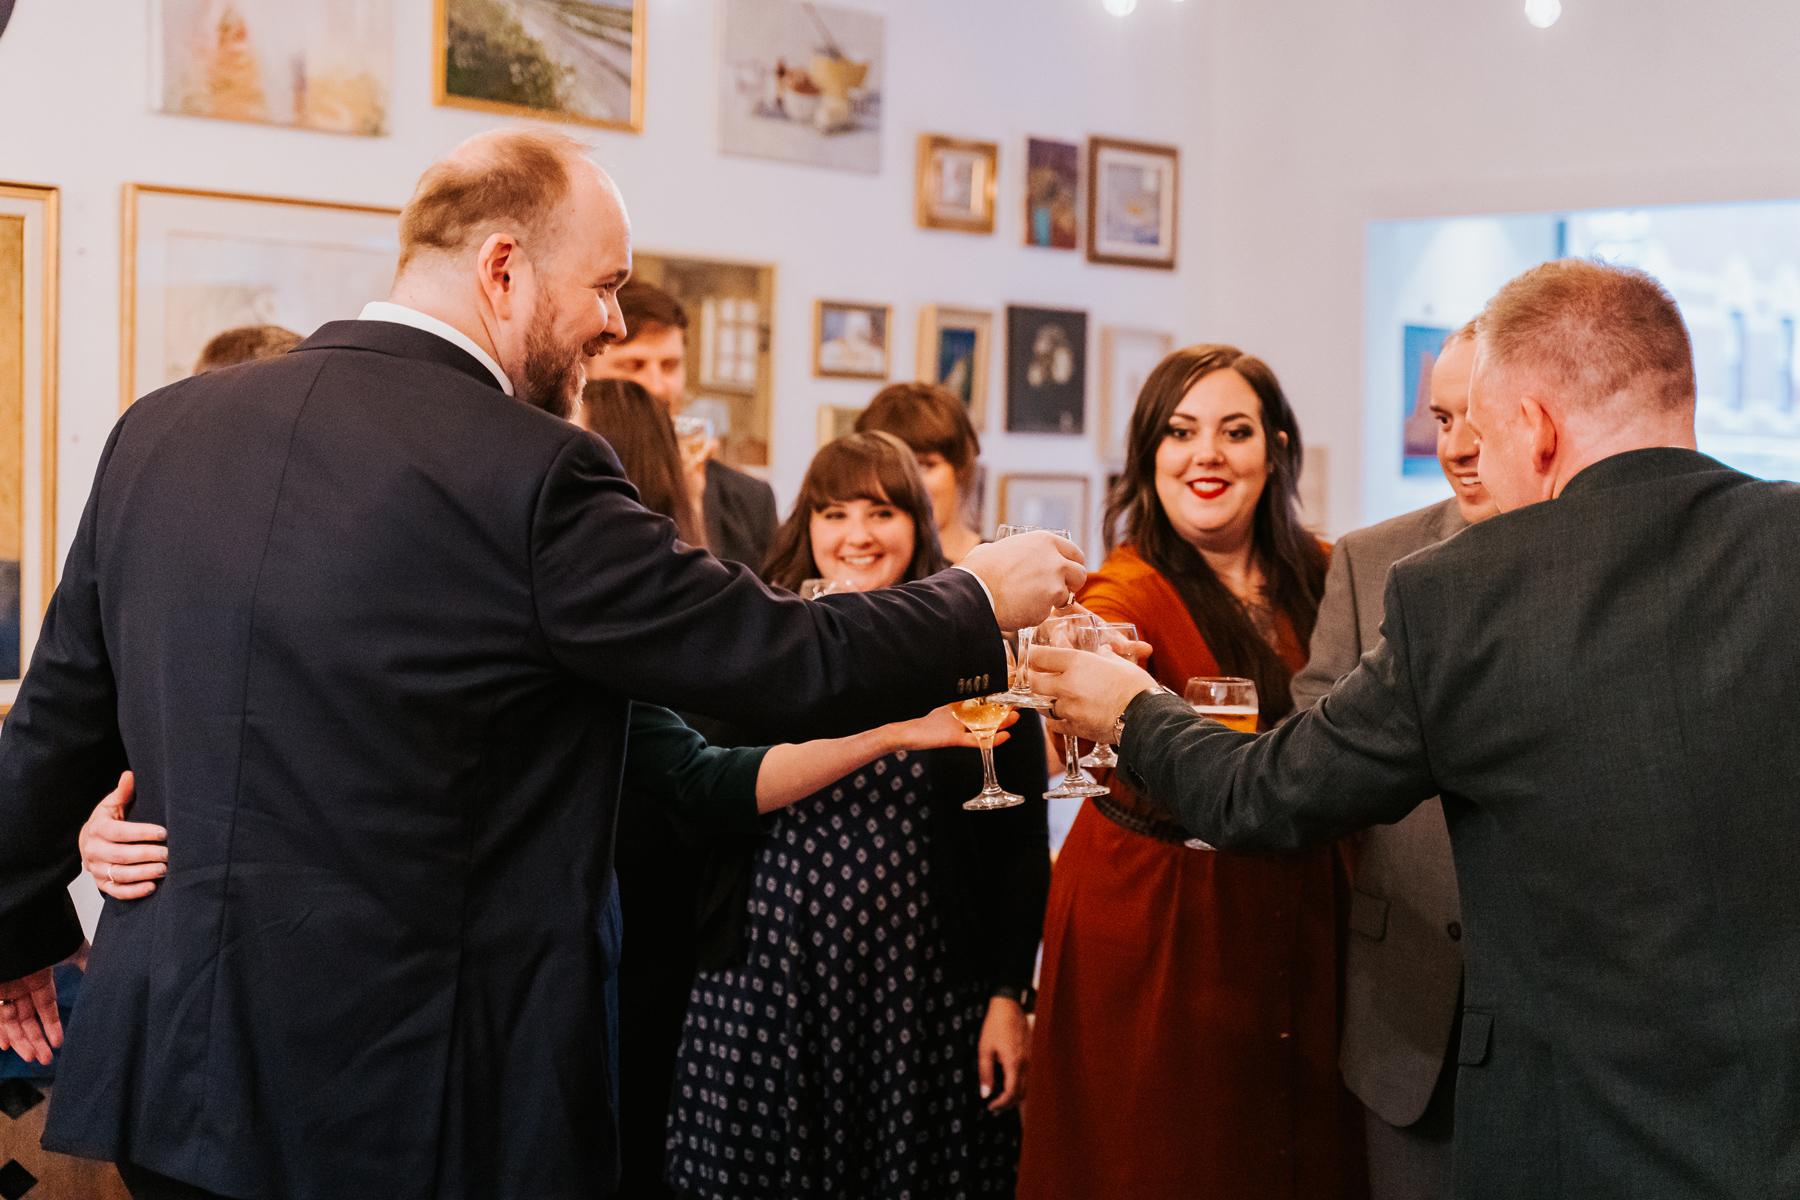 026-fredericton-wedding-kandise-brown-dm2020